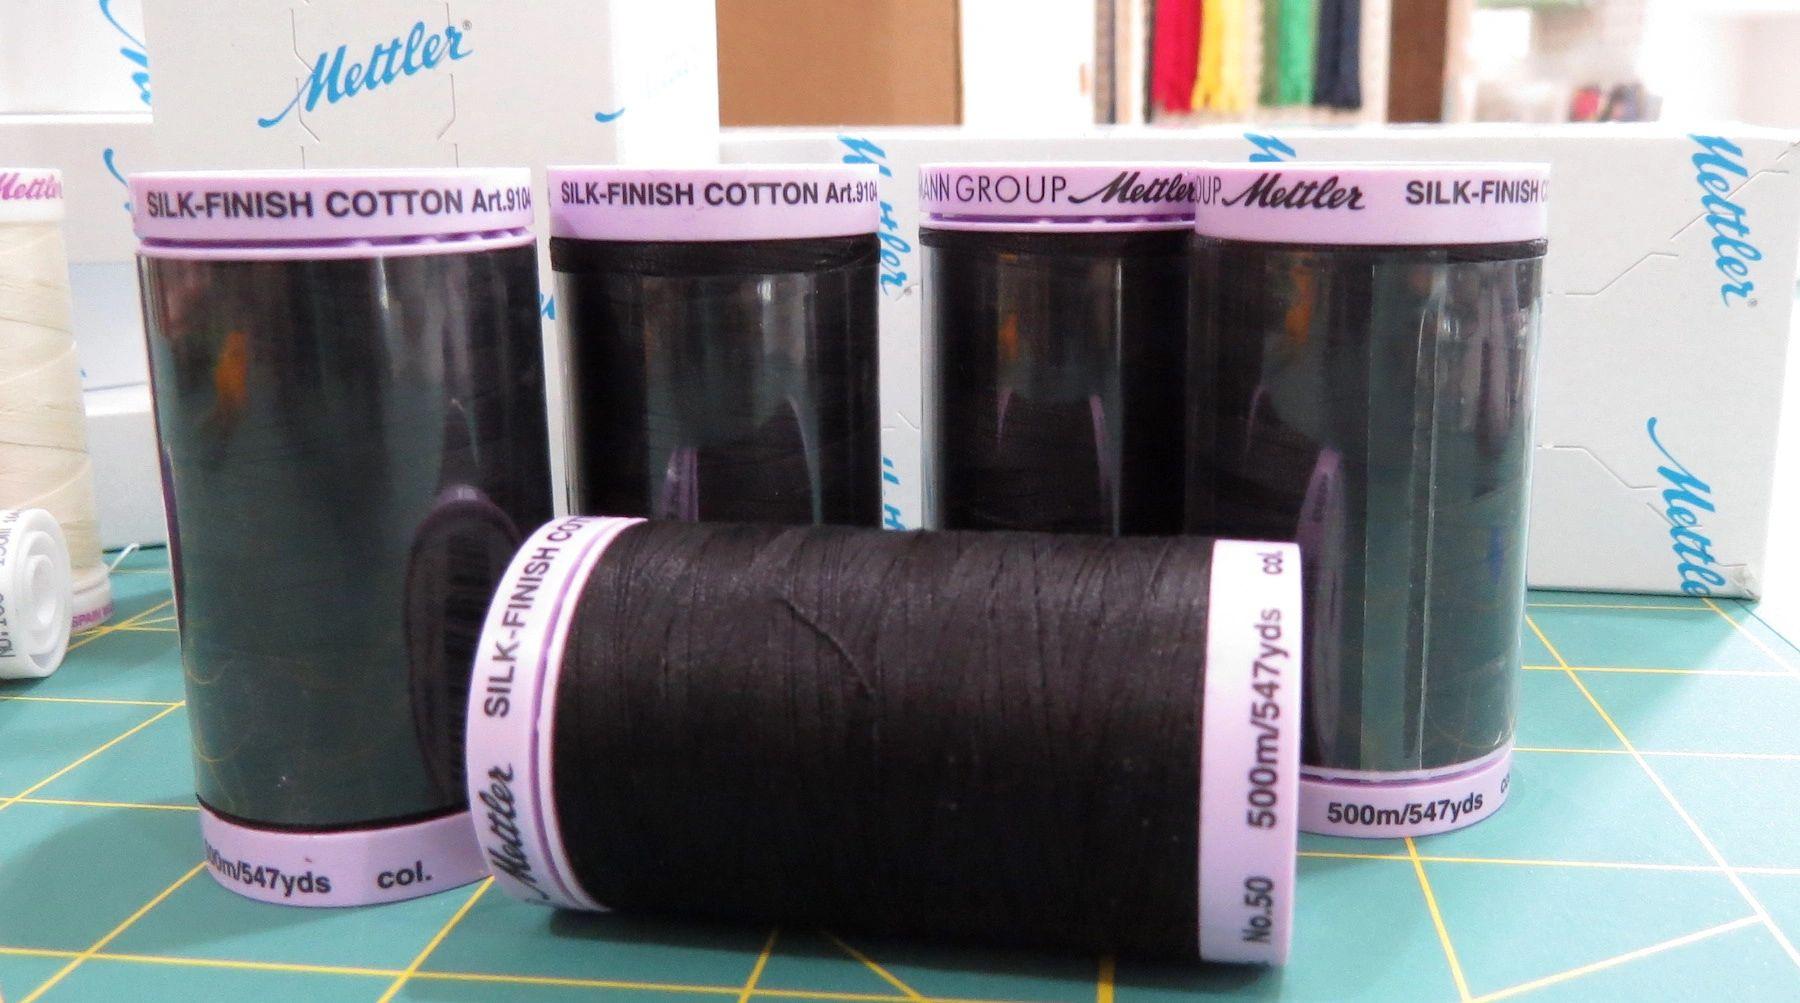 Mettler Black Silk Wrapped Cotton Thread 547 Yd Spool